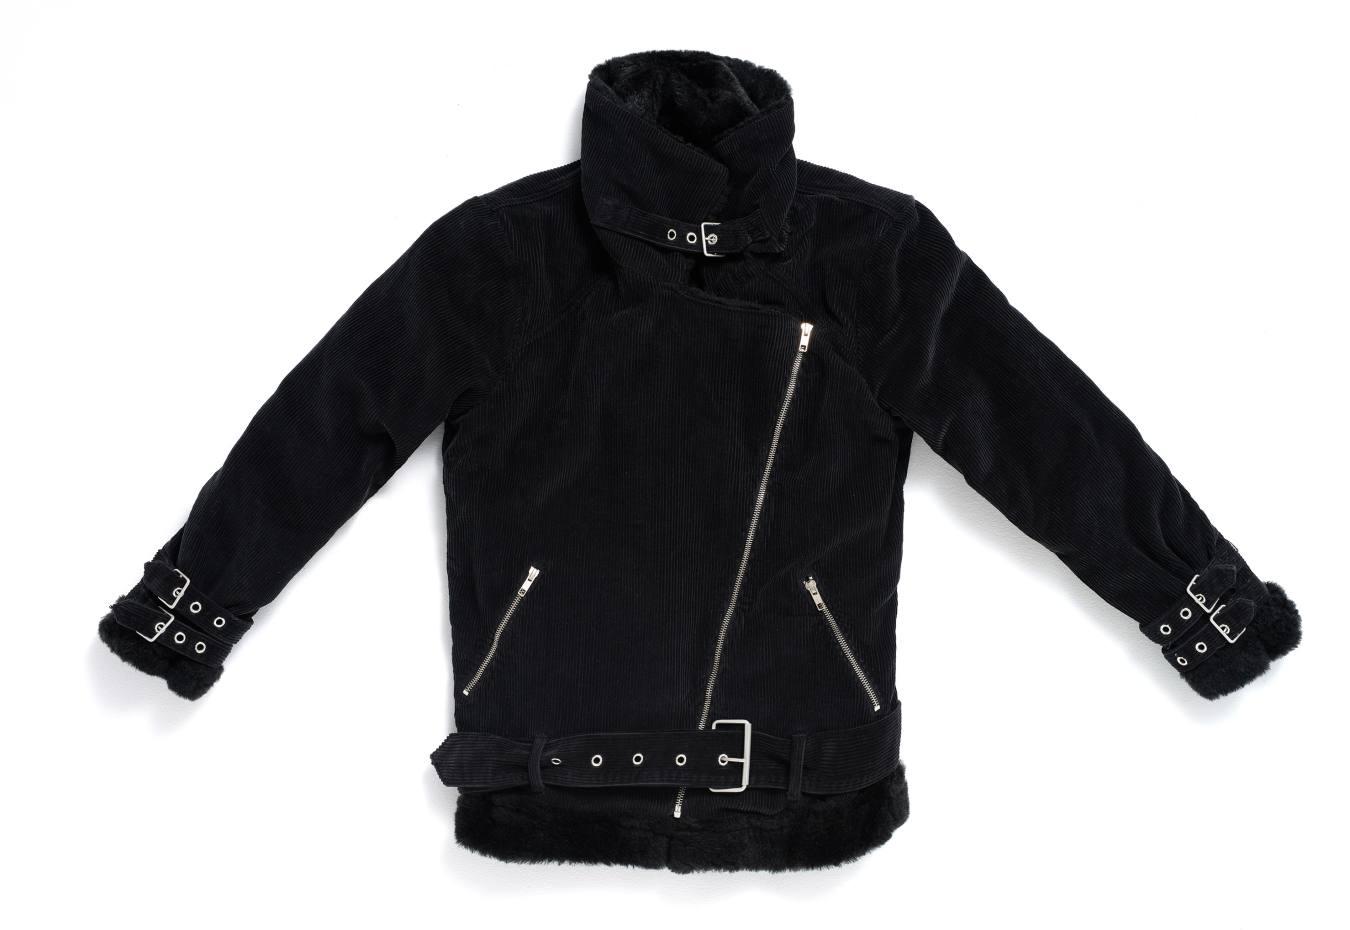 The Cords & Co corduroy biker jacket, $475